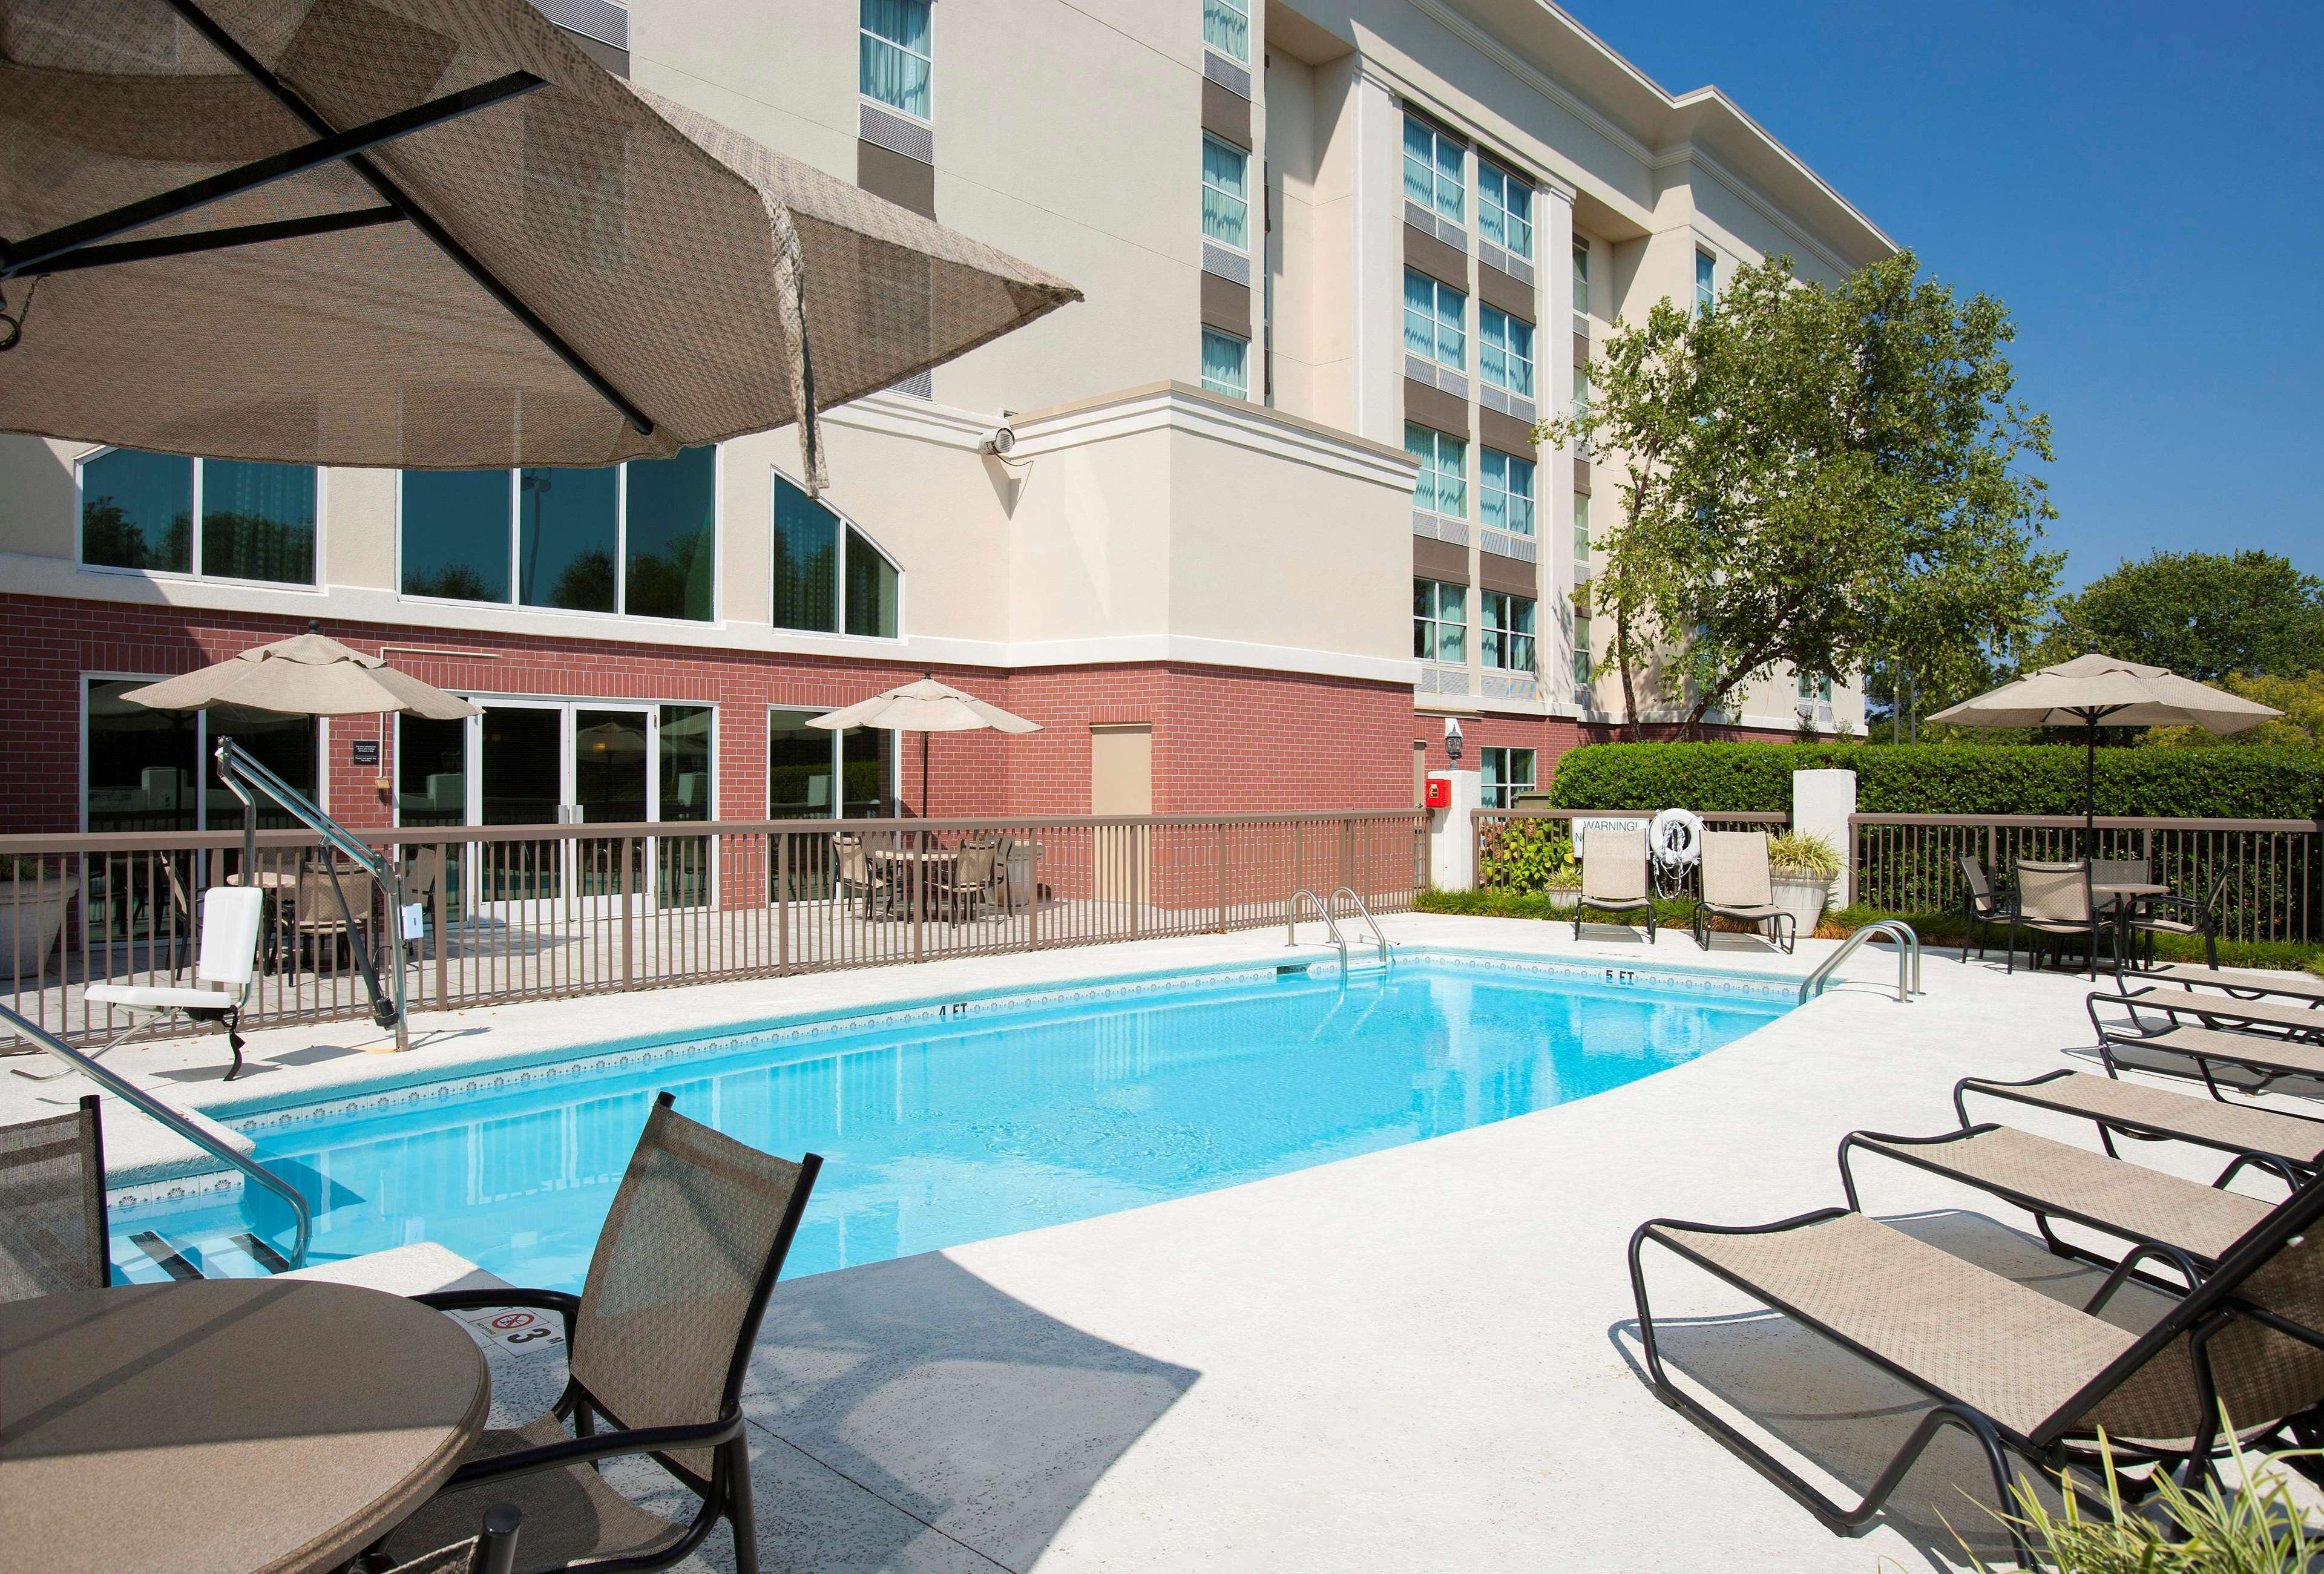 Hampton Inn & Suites Charlotte/Pineville image 12